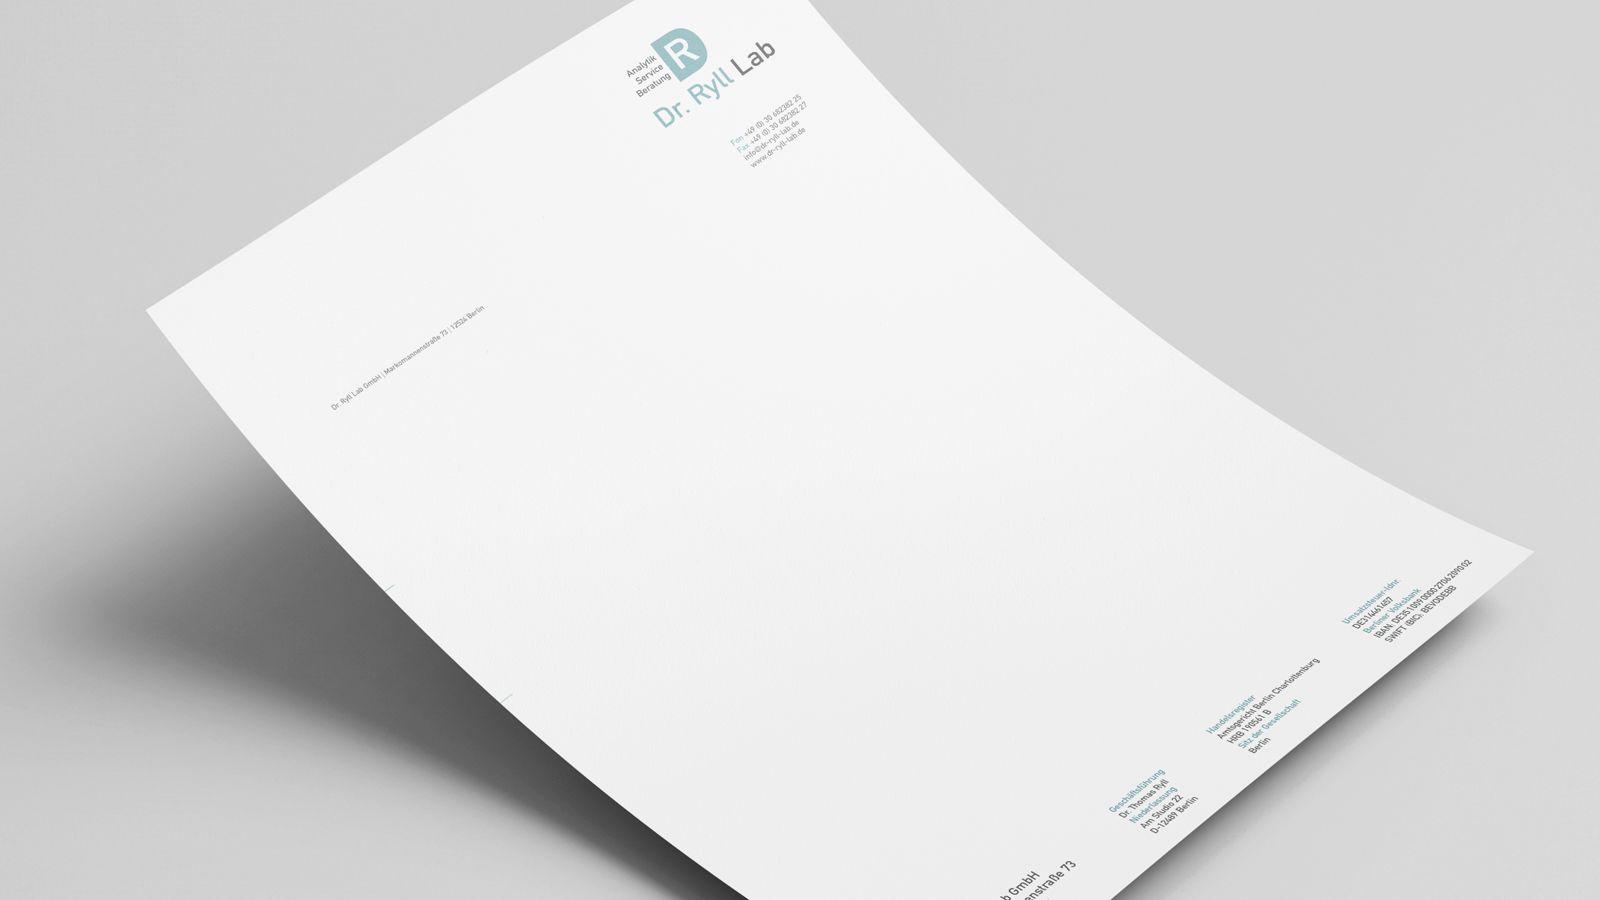 Start-up-Marketing | Dr. Ryll Lab GmbH